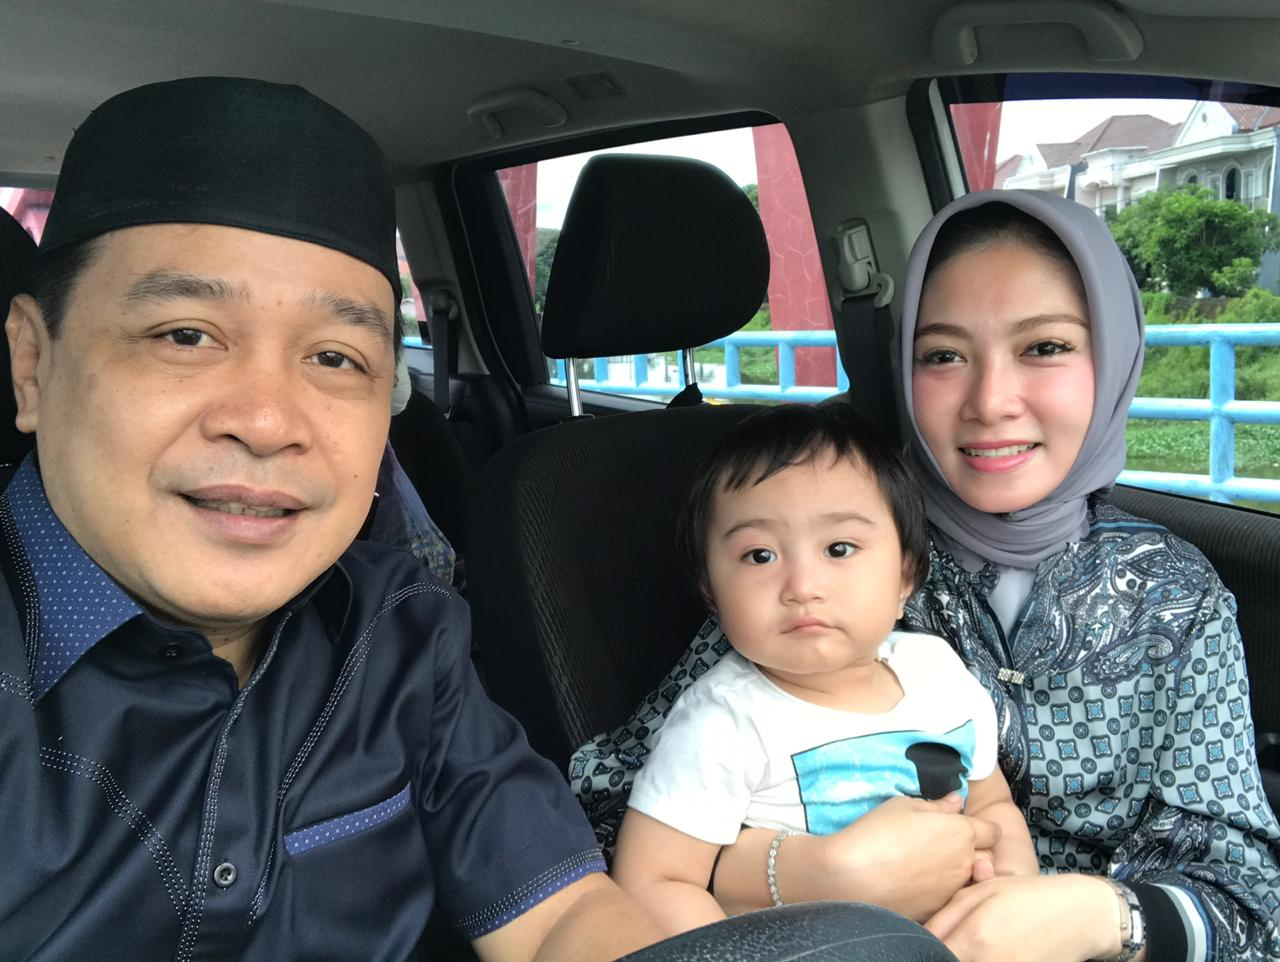 Masuki Hari Tenang, Supriansa Ajak Anaknya Main ke Mall